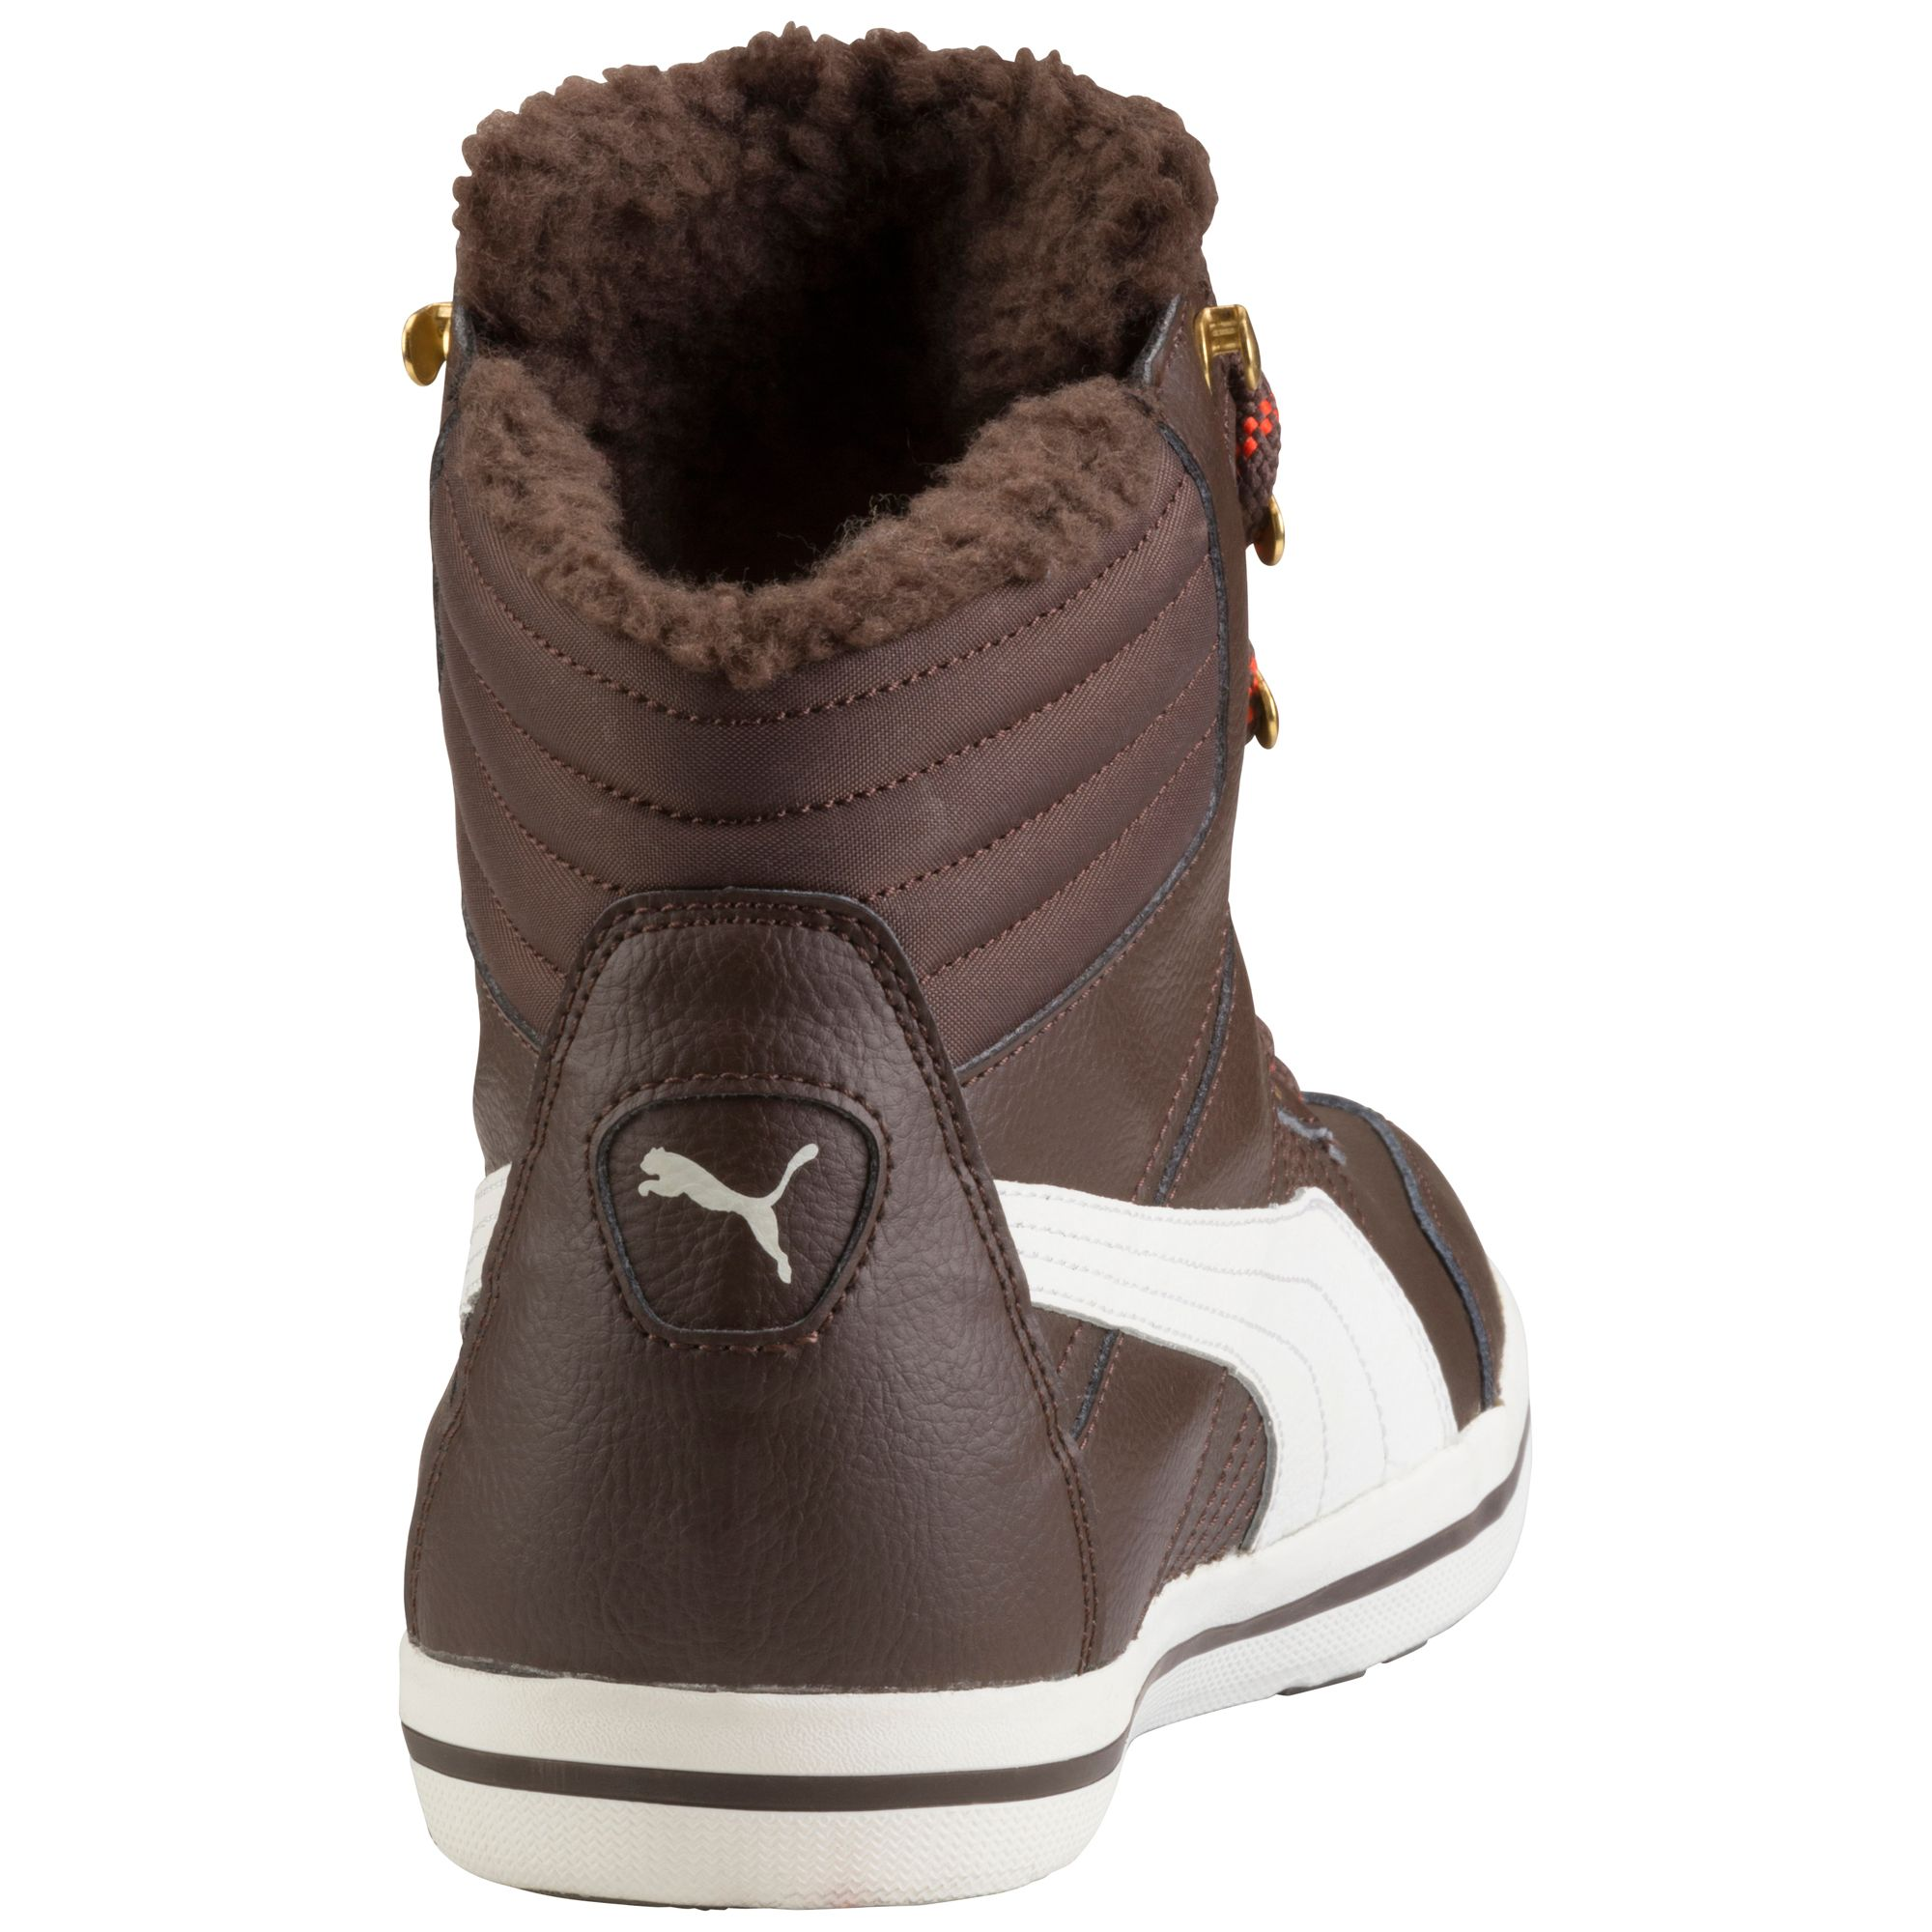 1599ab2b937c05 PUMA Tatau Sneaker Stiefel Schuhe Winterschuhe Modern Sport Männer ...